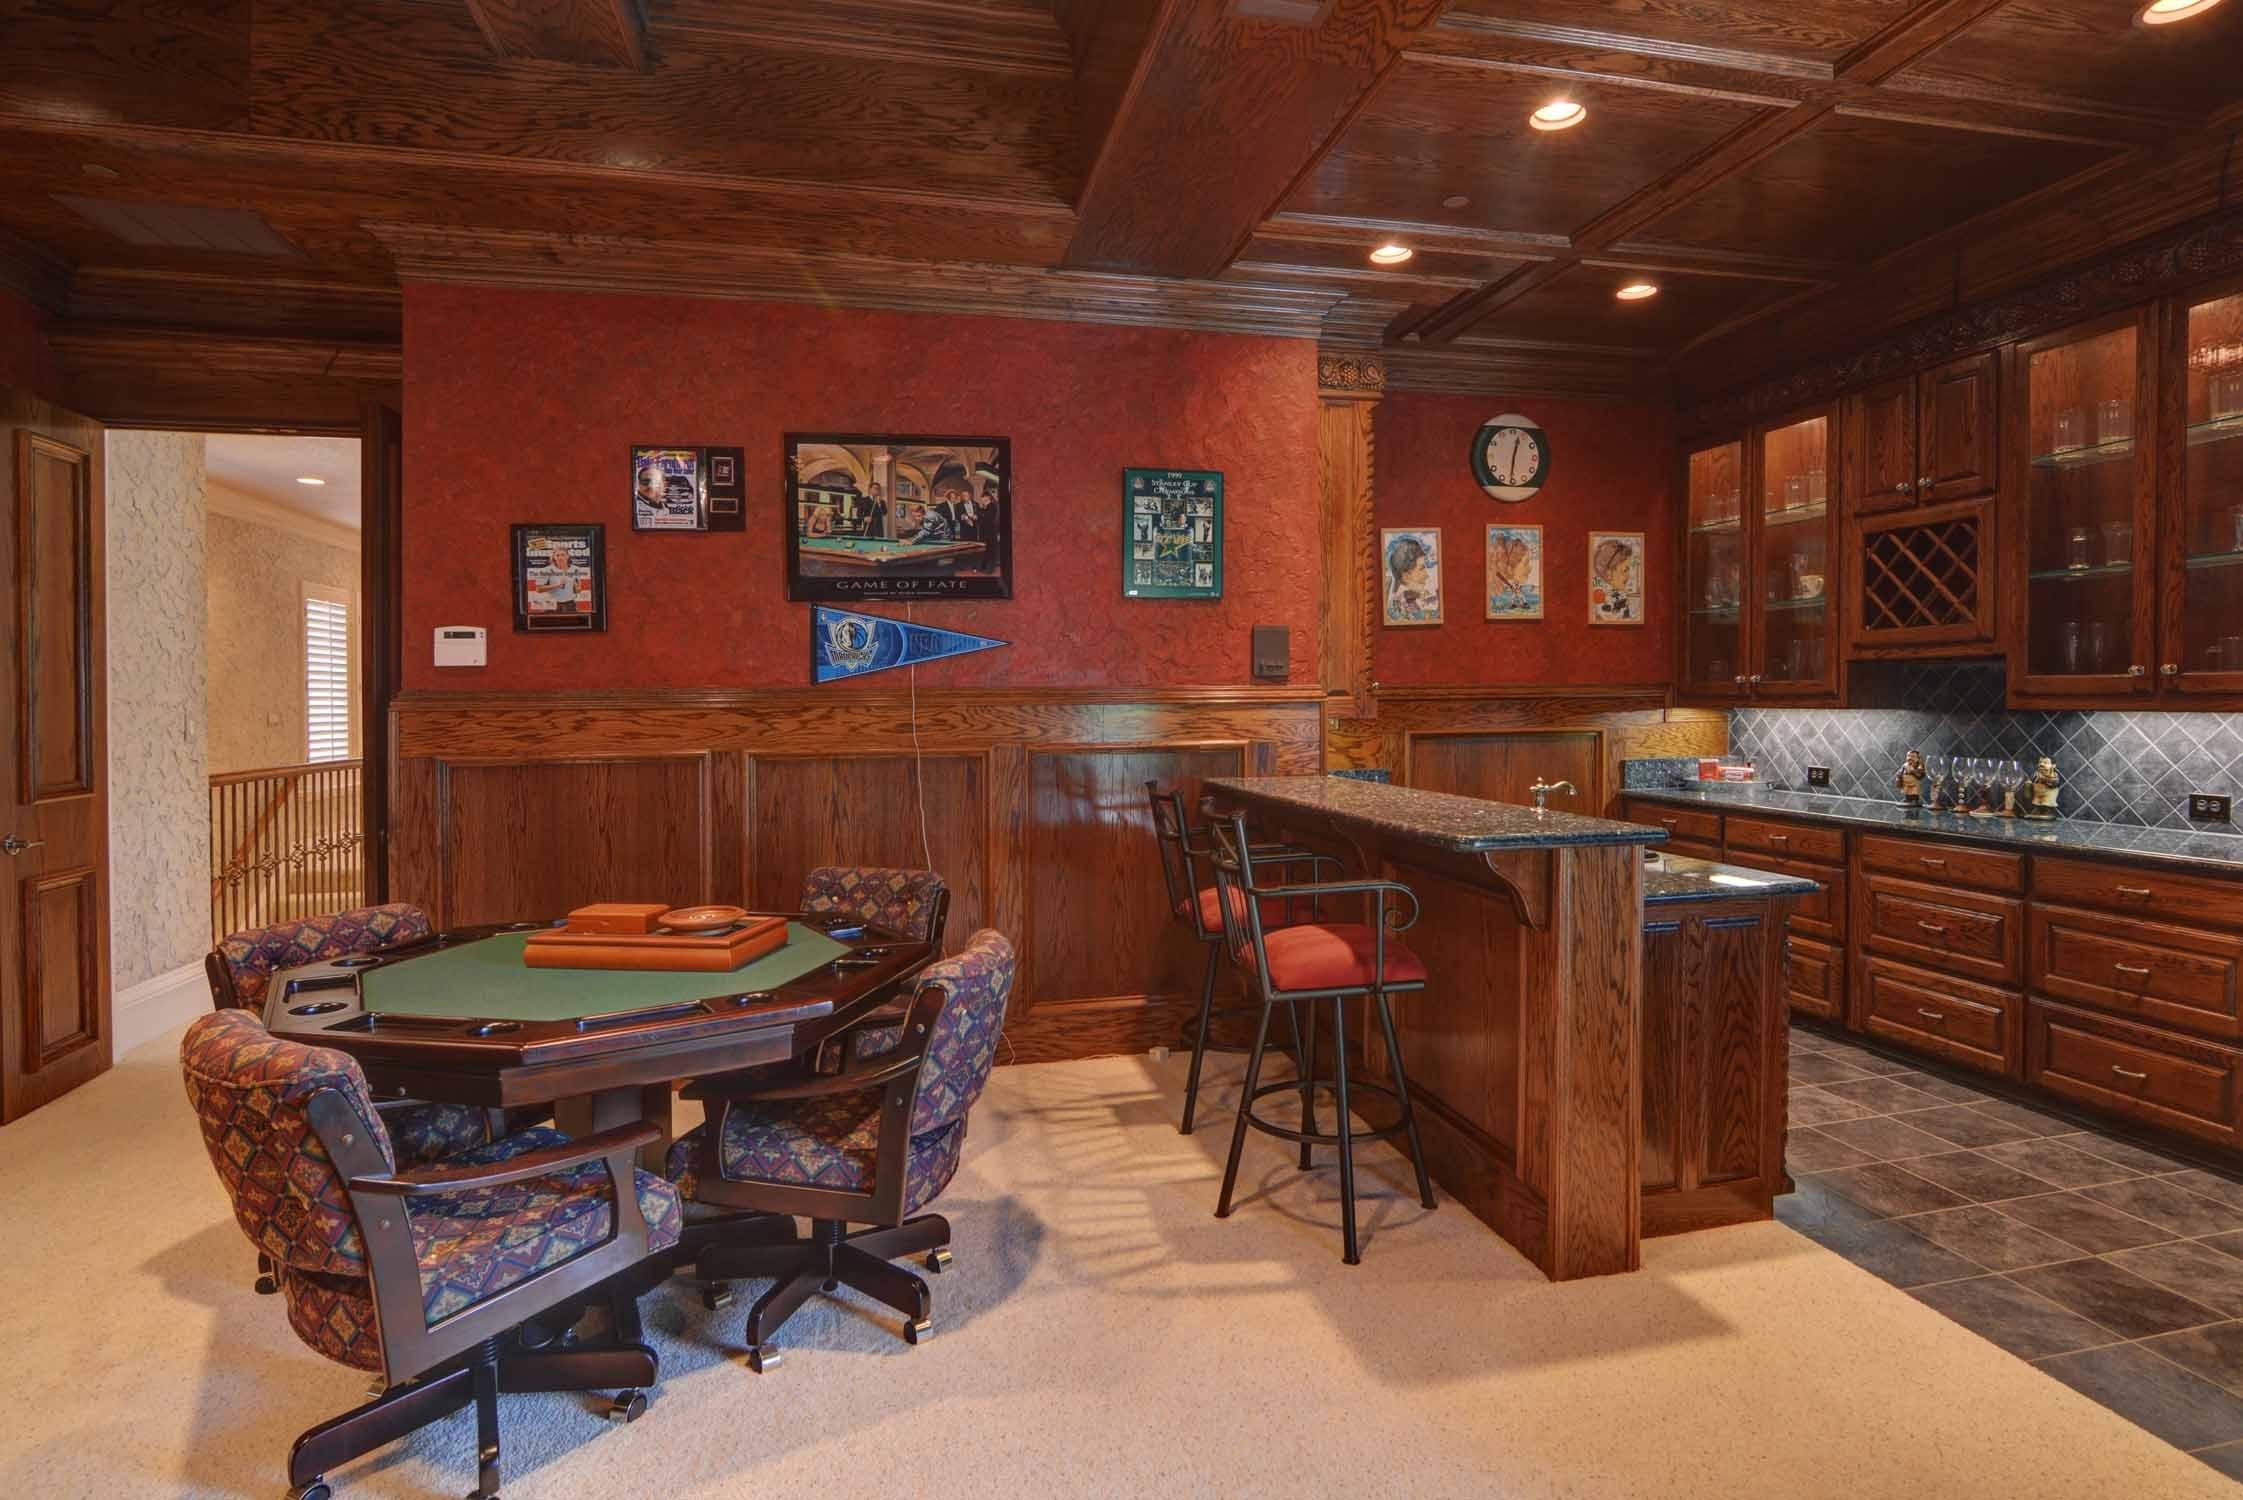 Dreaming of a man cave, home recording studio, bar, game room, or home theater? Game Room Bar - J. Lambert Custom Homes